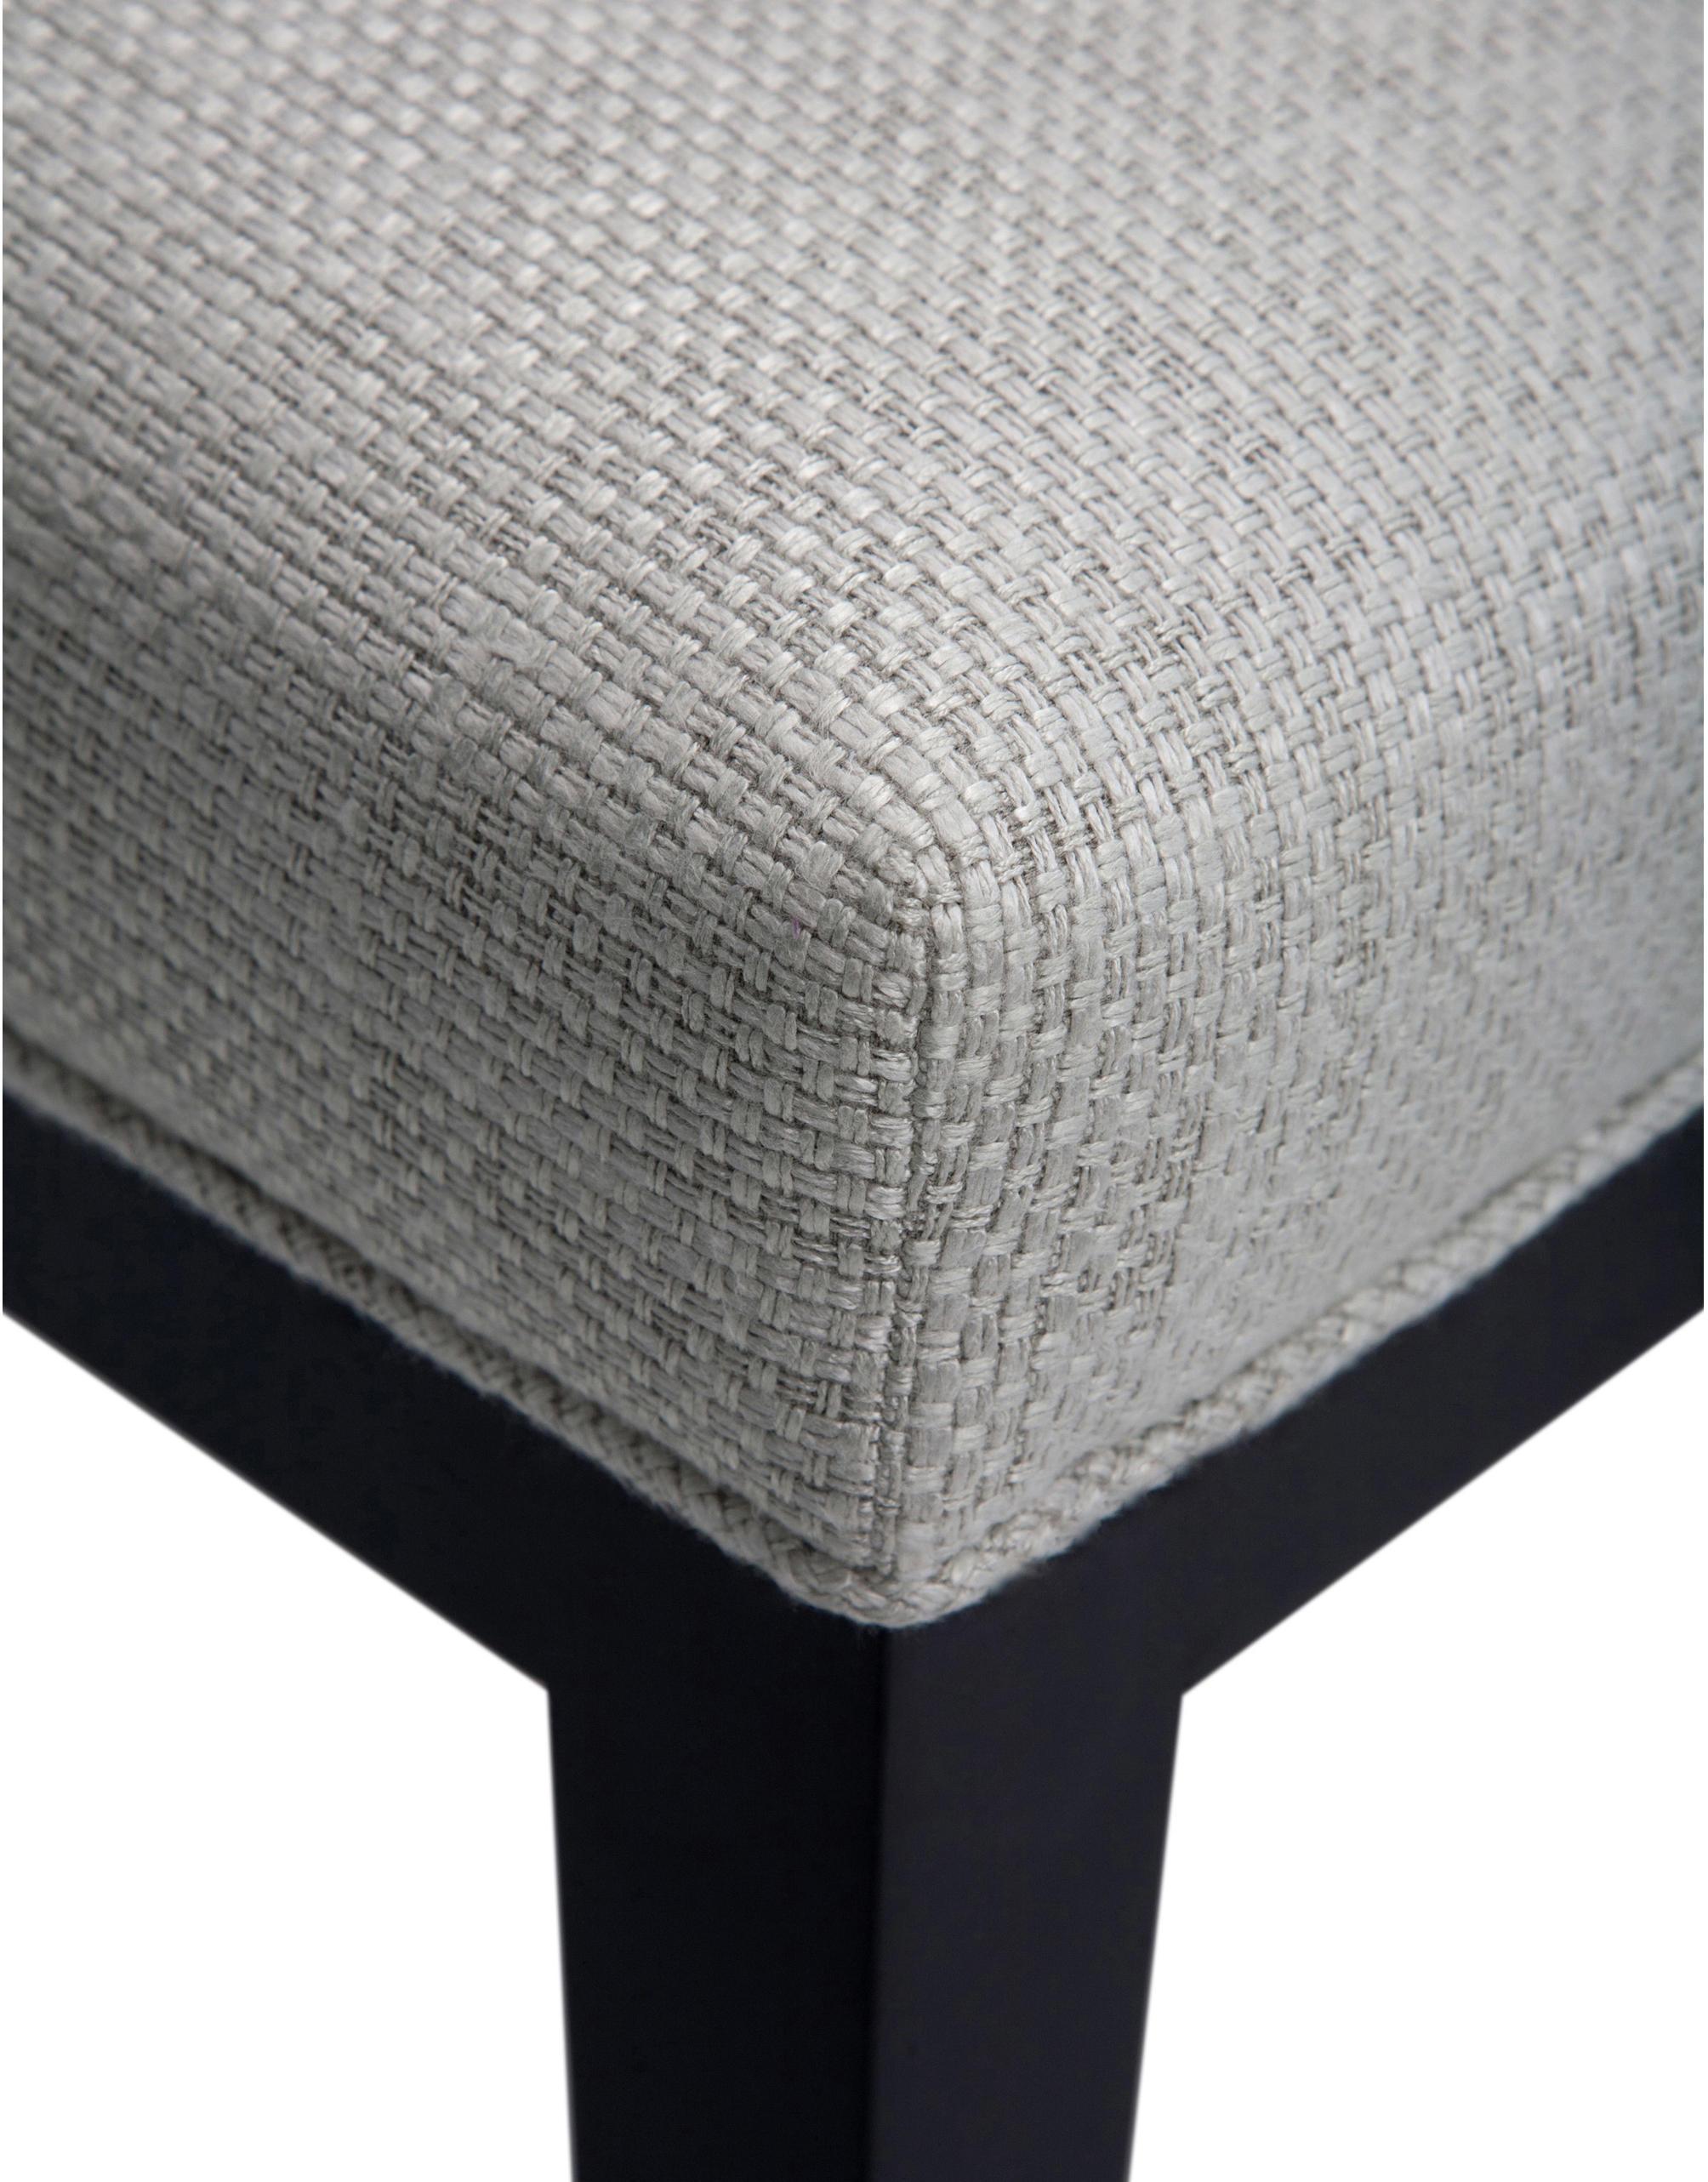 ... Byron Dining Chair By The Sofa U0026 Chair Company Ltd | Restaurant Chairs